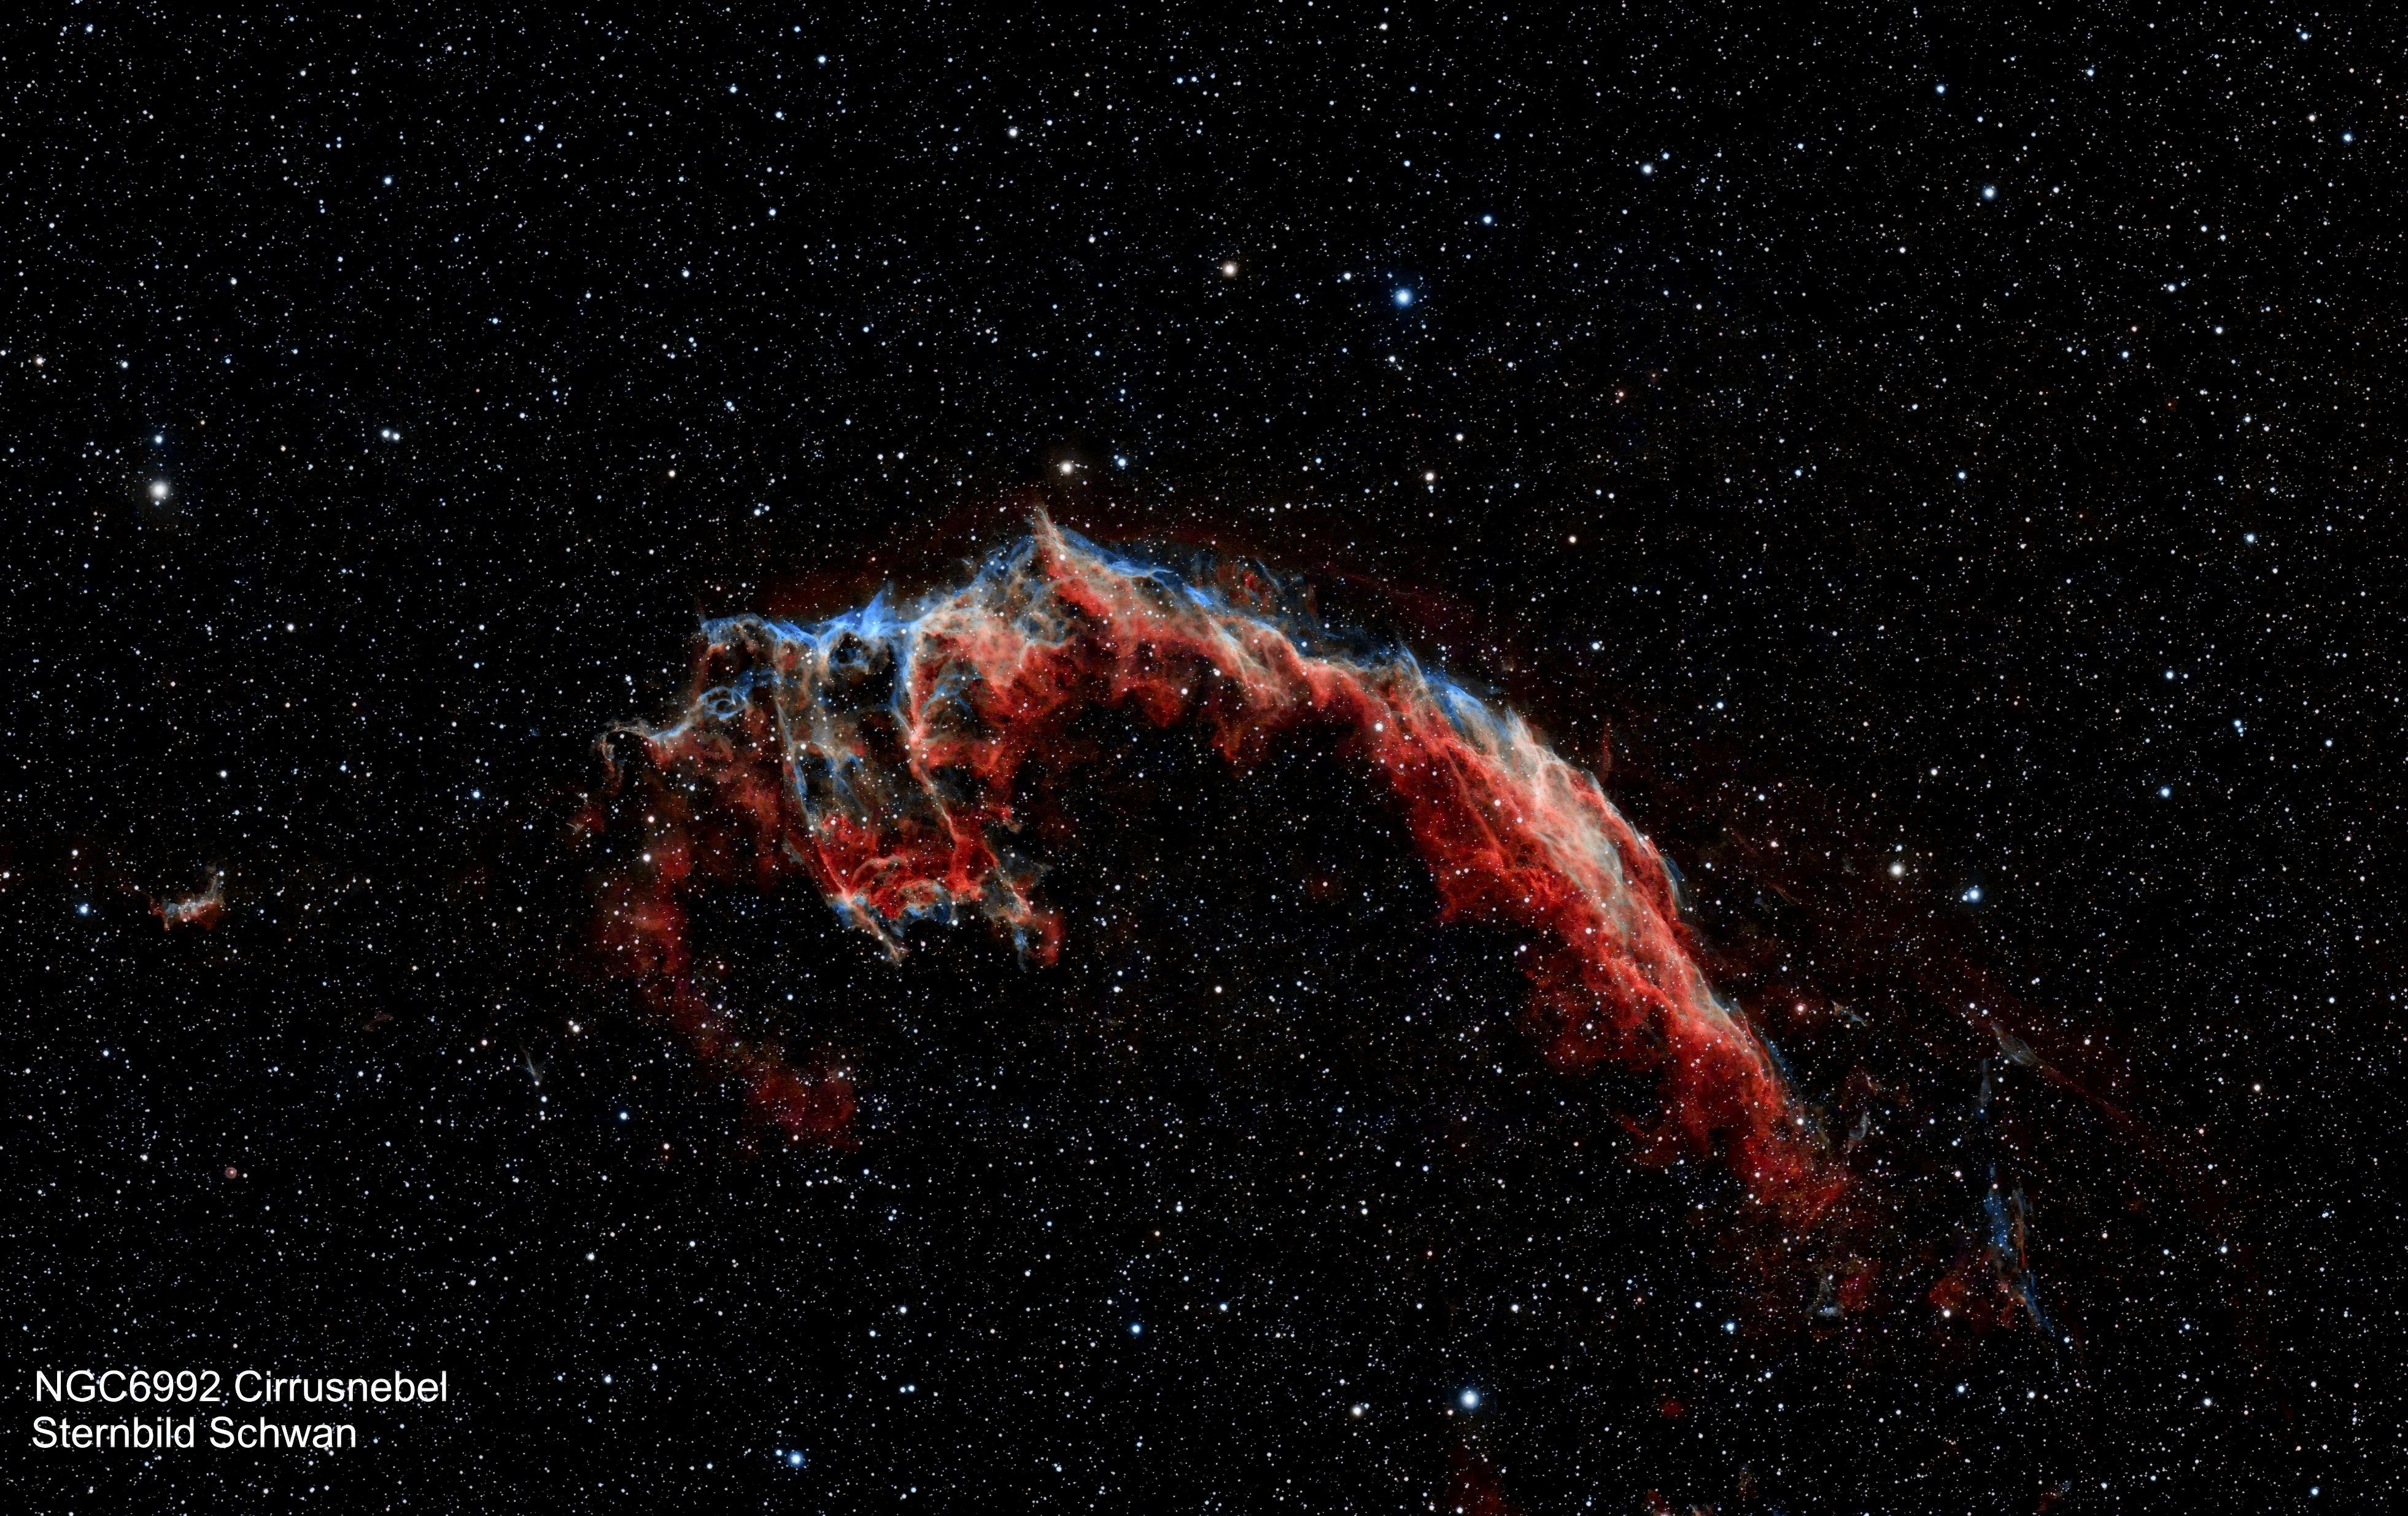 NGC 6992 Cirrusnebel